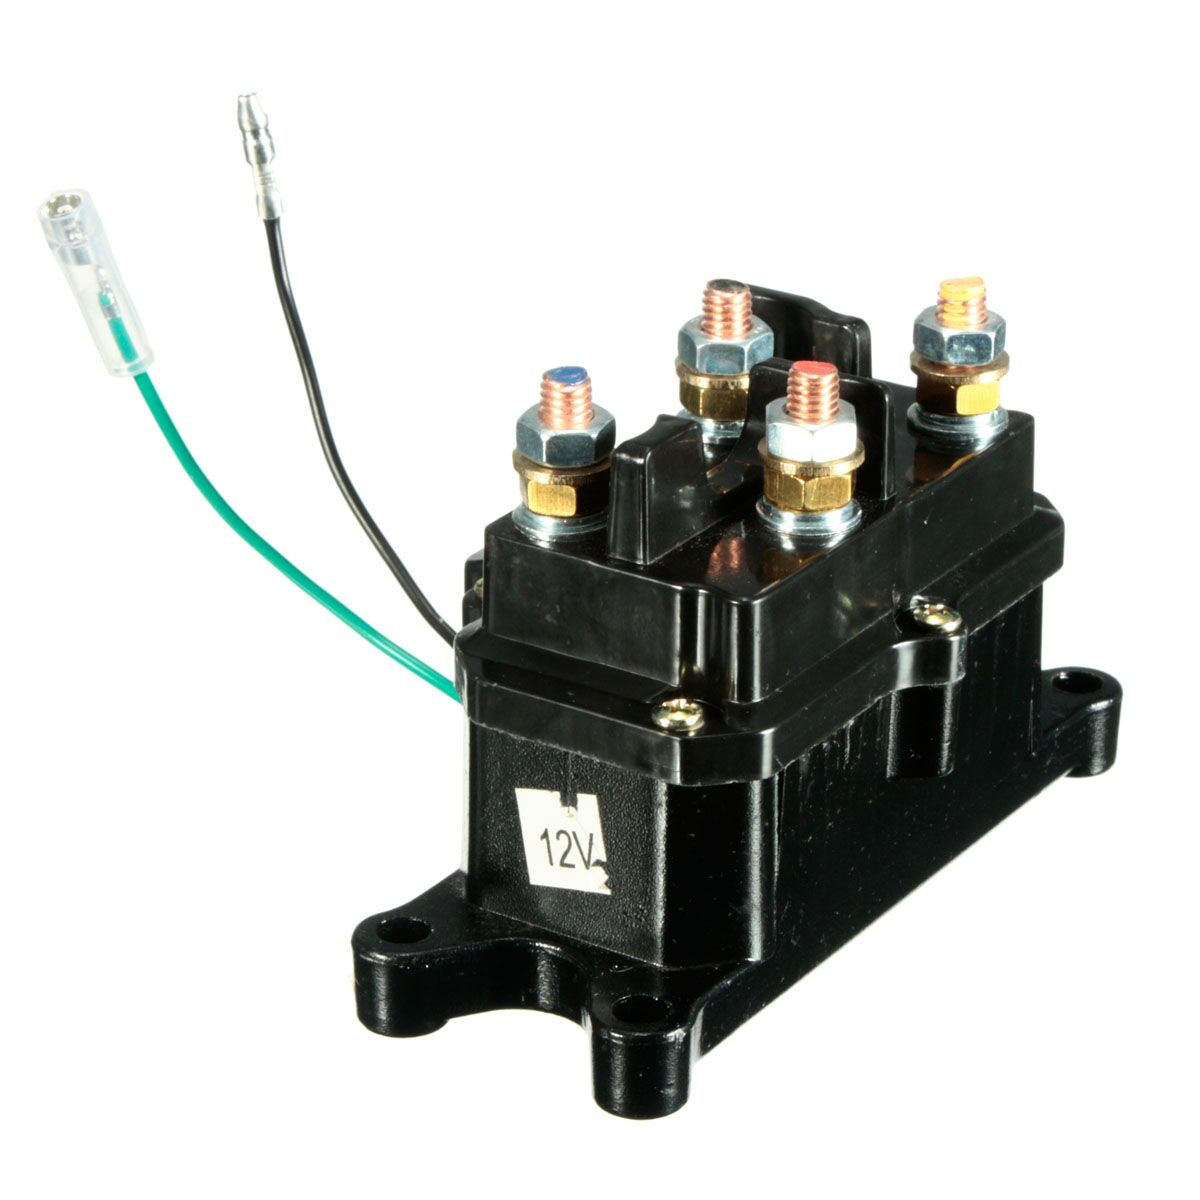 medium resolution of universal 12v solenoid relay contactor winch rocker switch thumb for atv utv practical 1 set